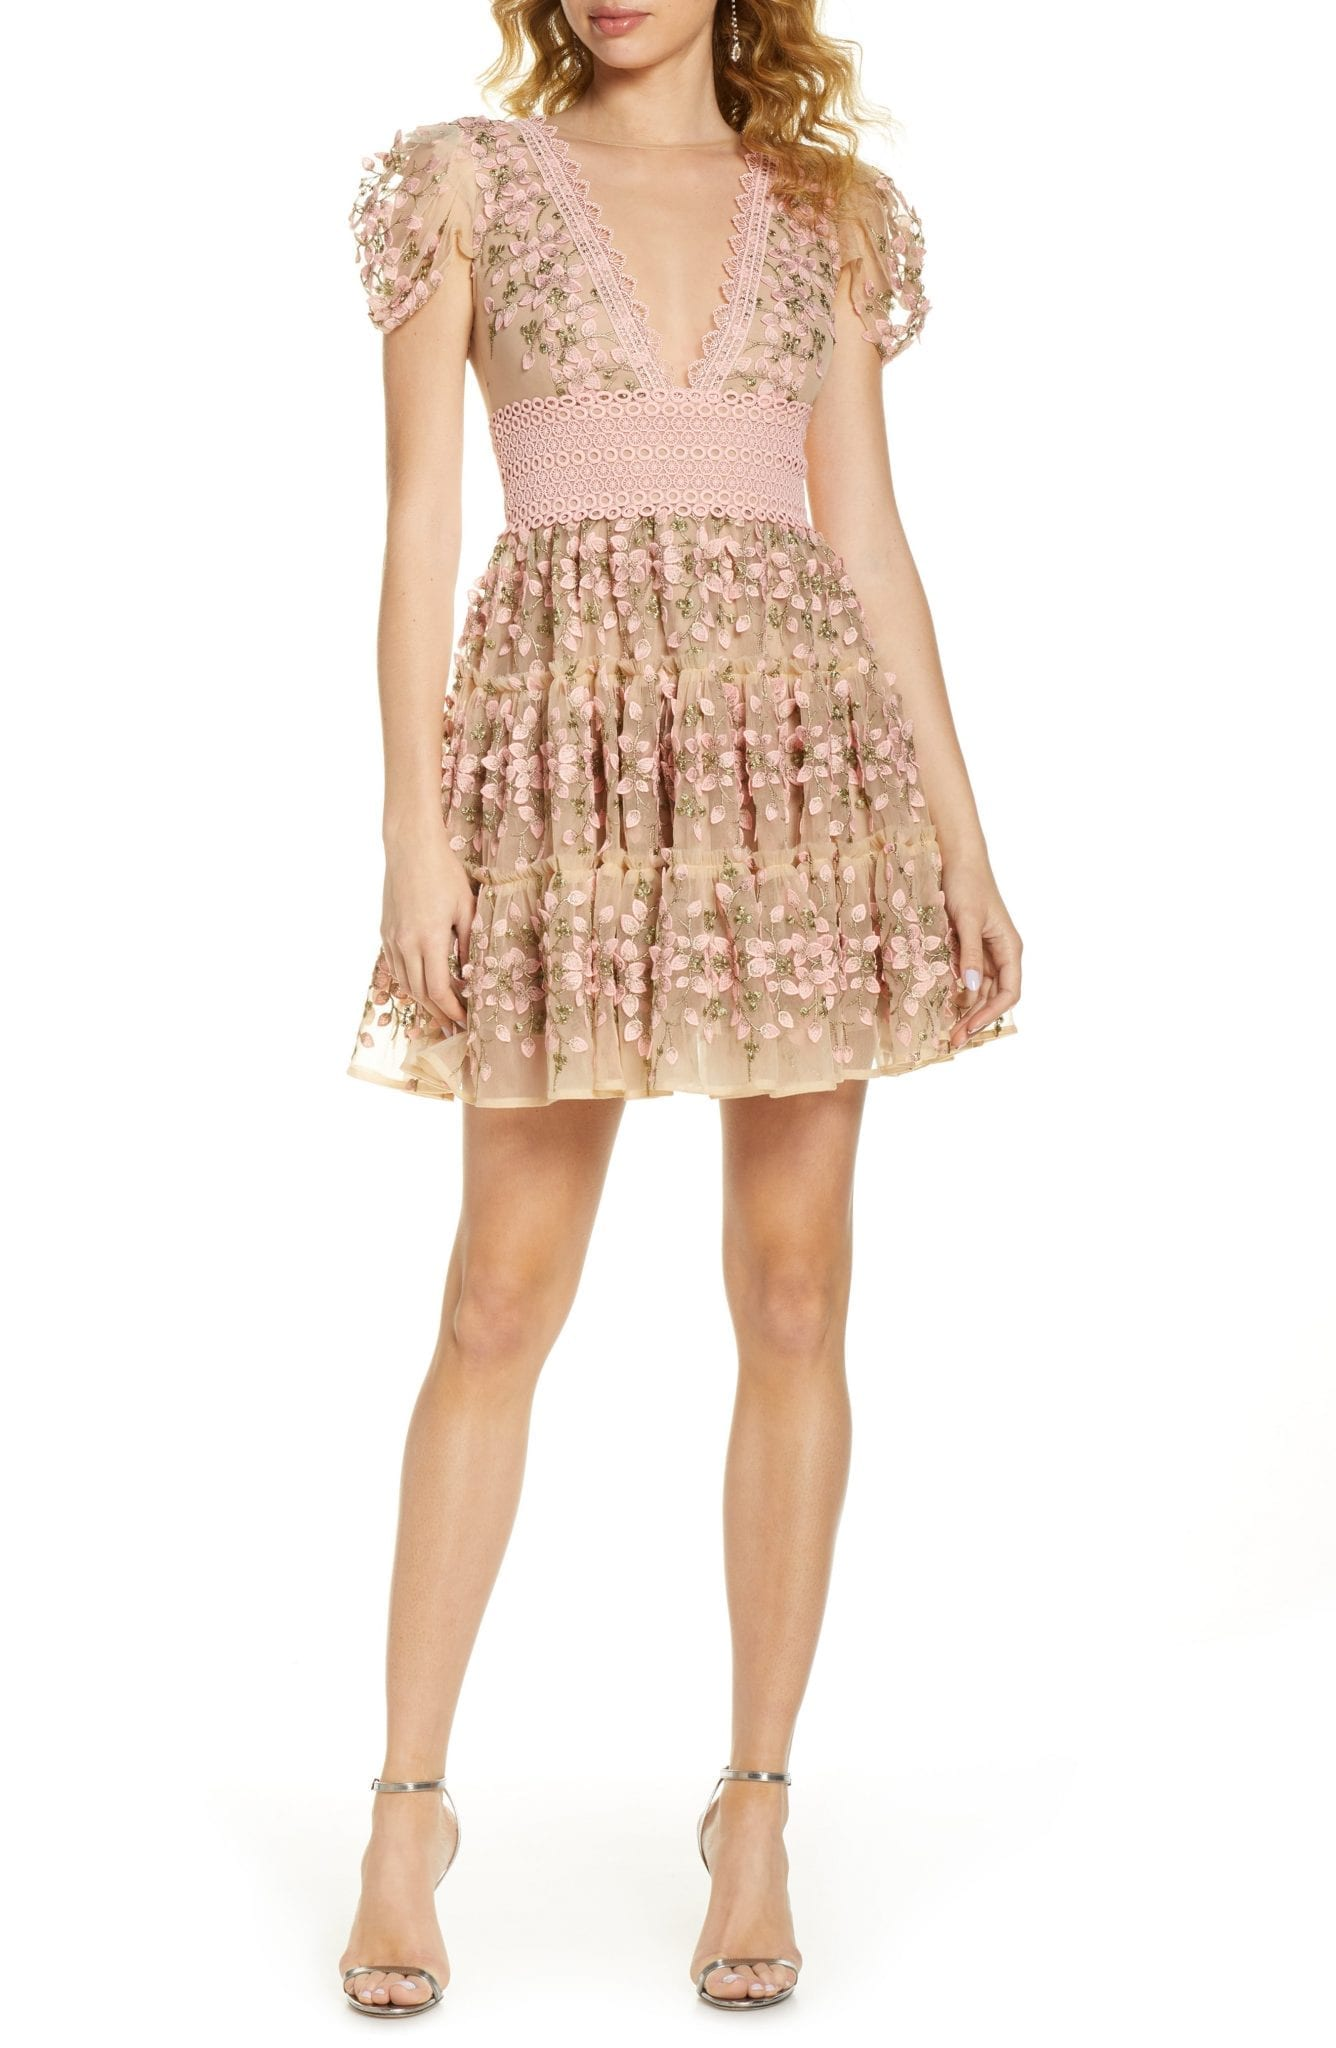 BRONX AND BANCO Megan Rose Floral Lace Mini Dress